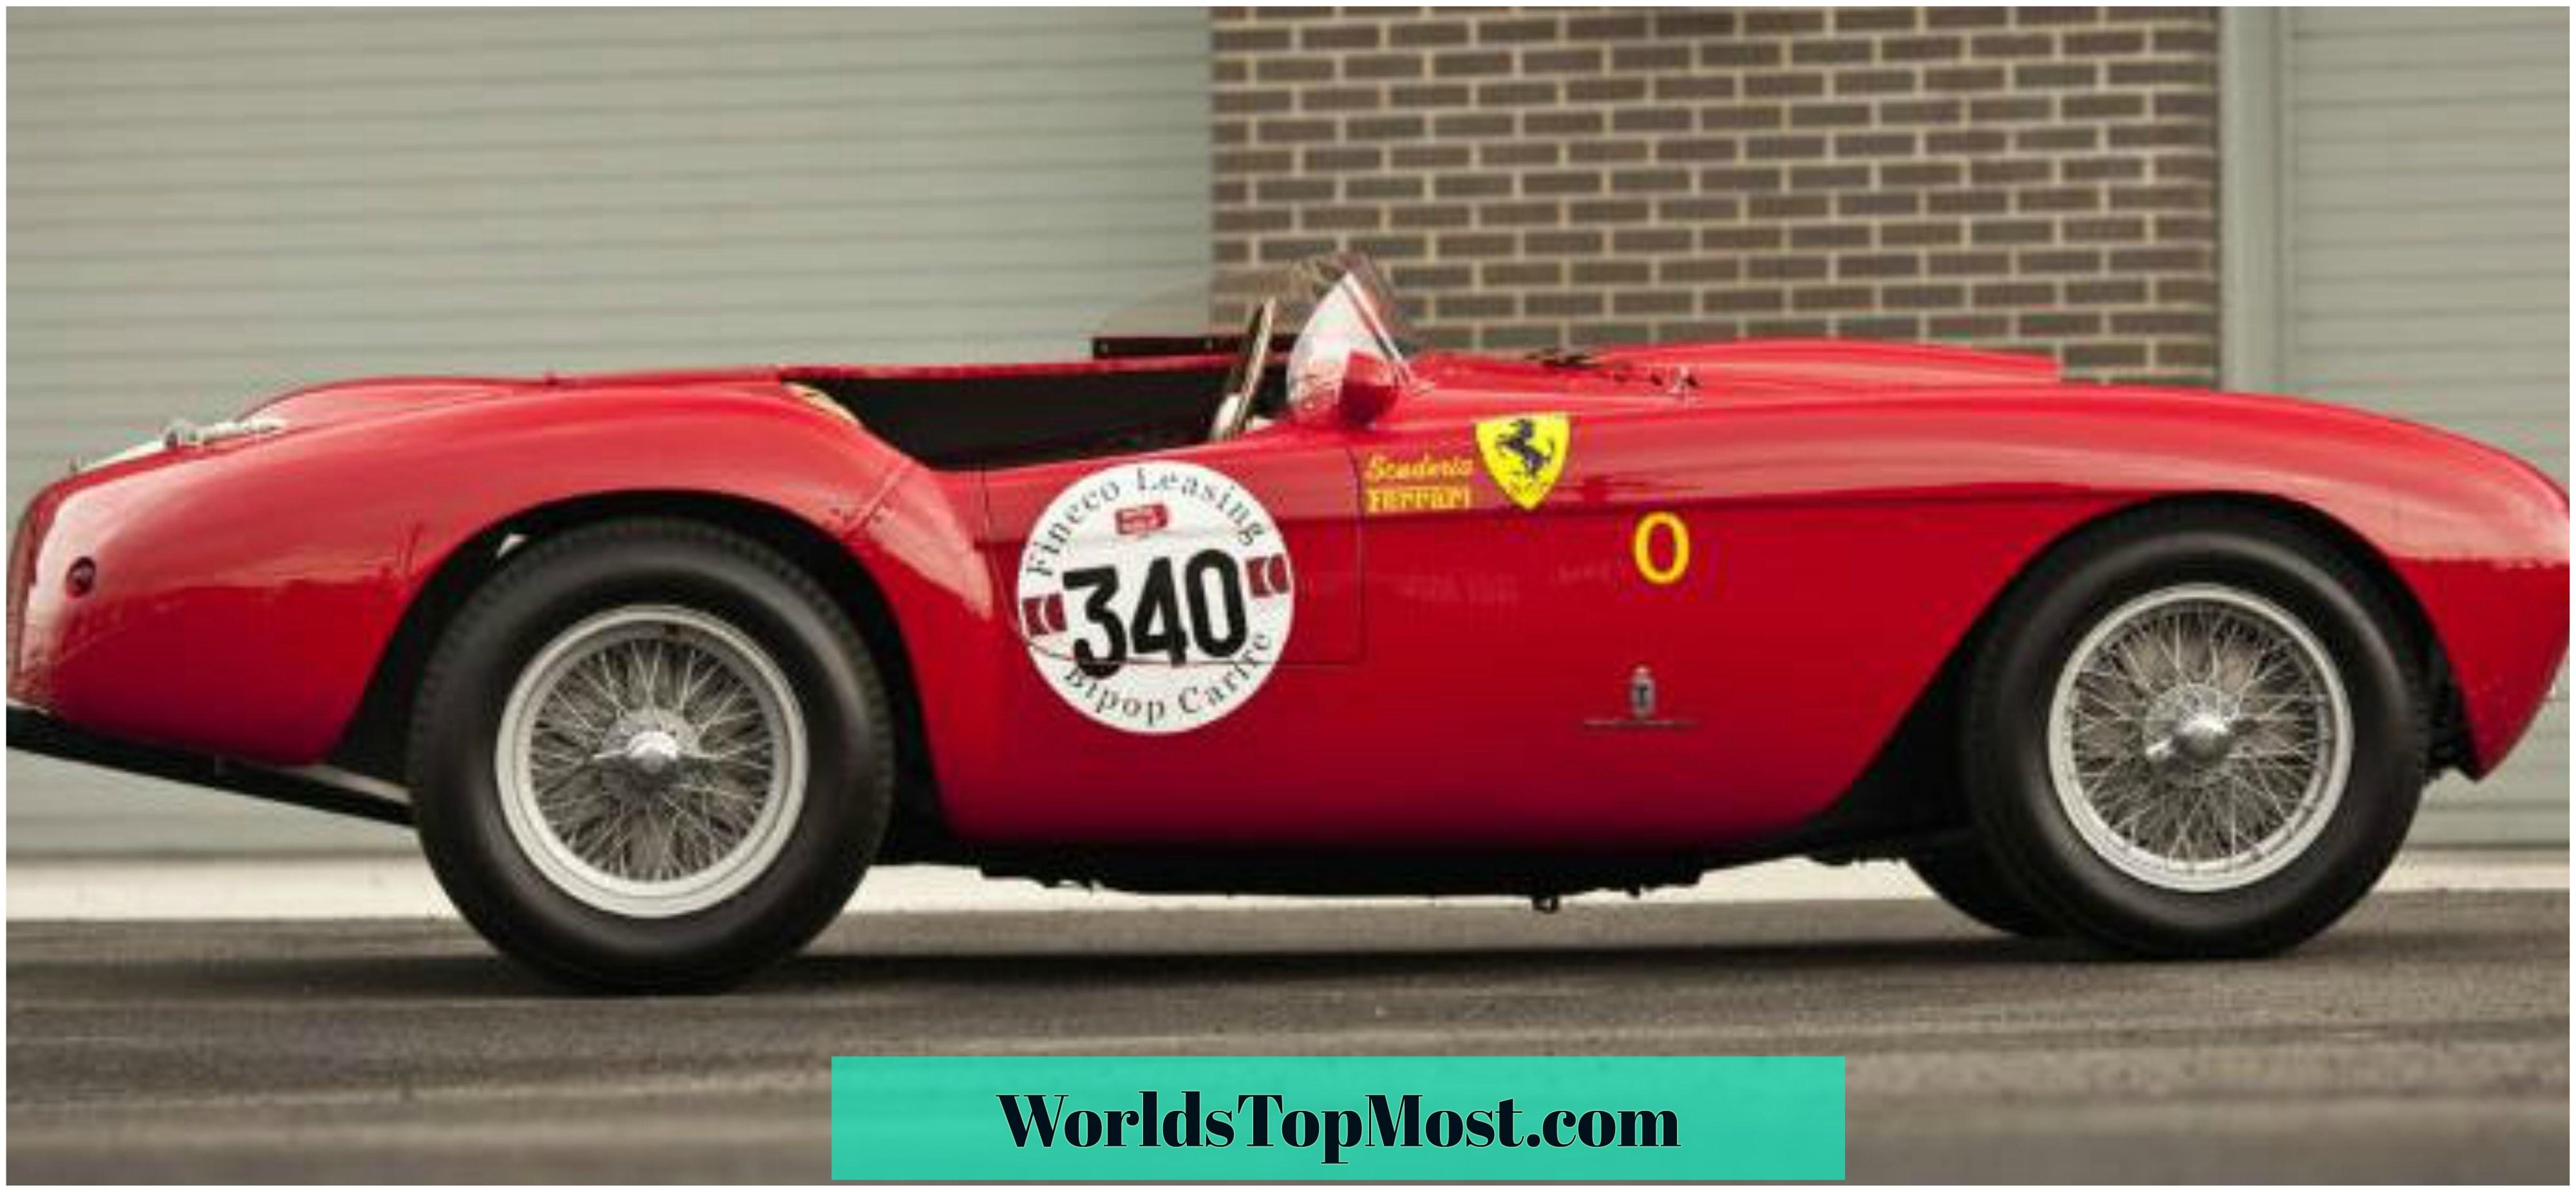 Most expensive Ferrari cars of 2017 Top 10 List